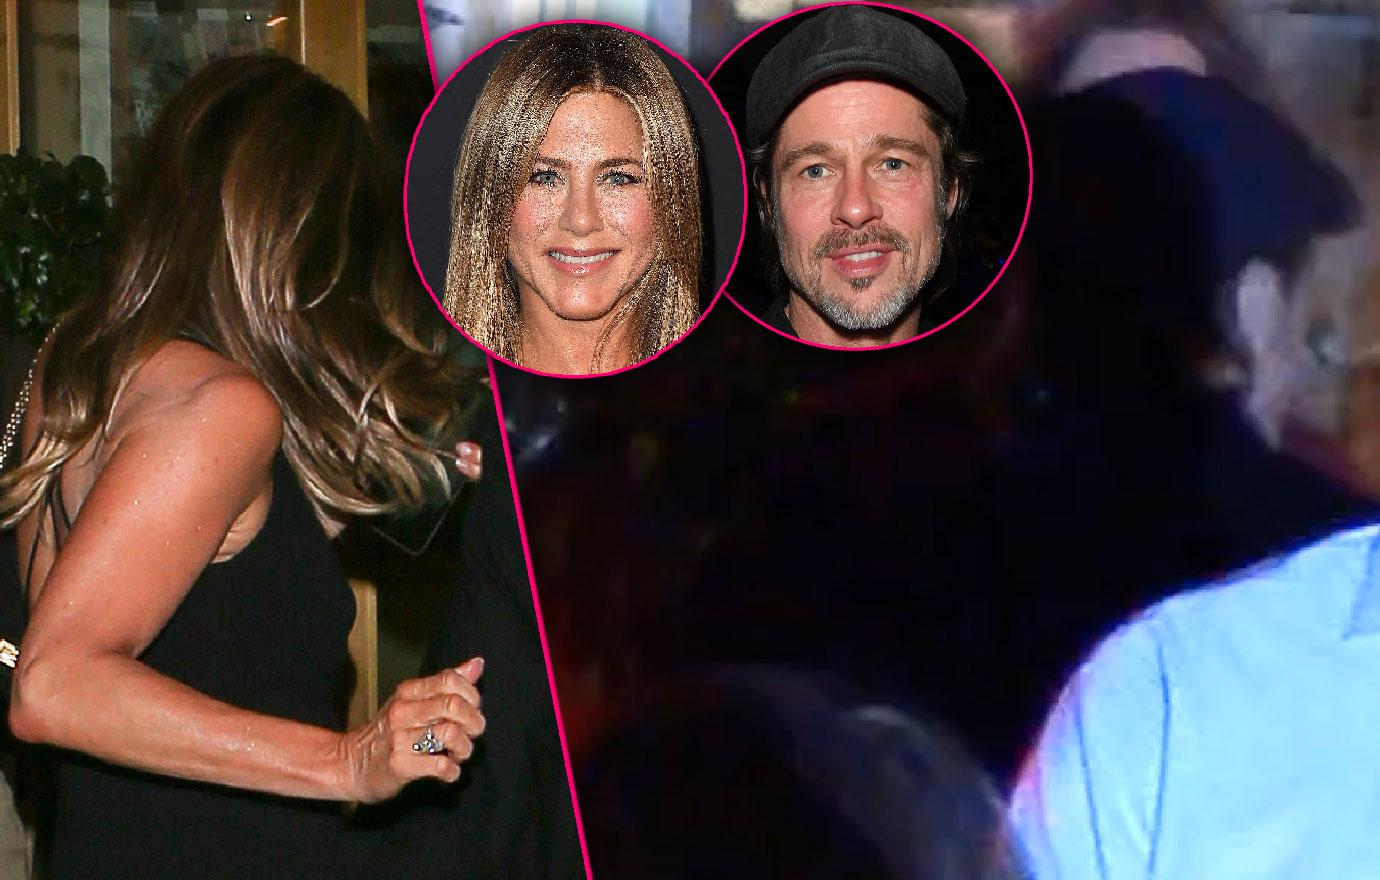 Brad Pitt Attends Ex Jennifer Aniston's 50th Birthday Party